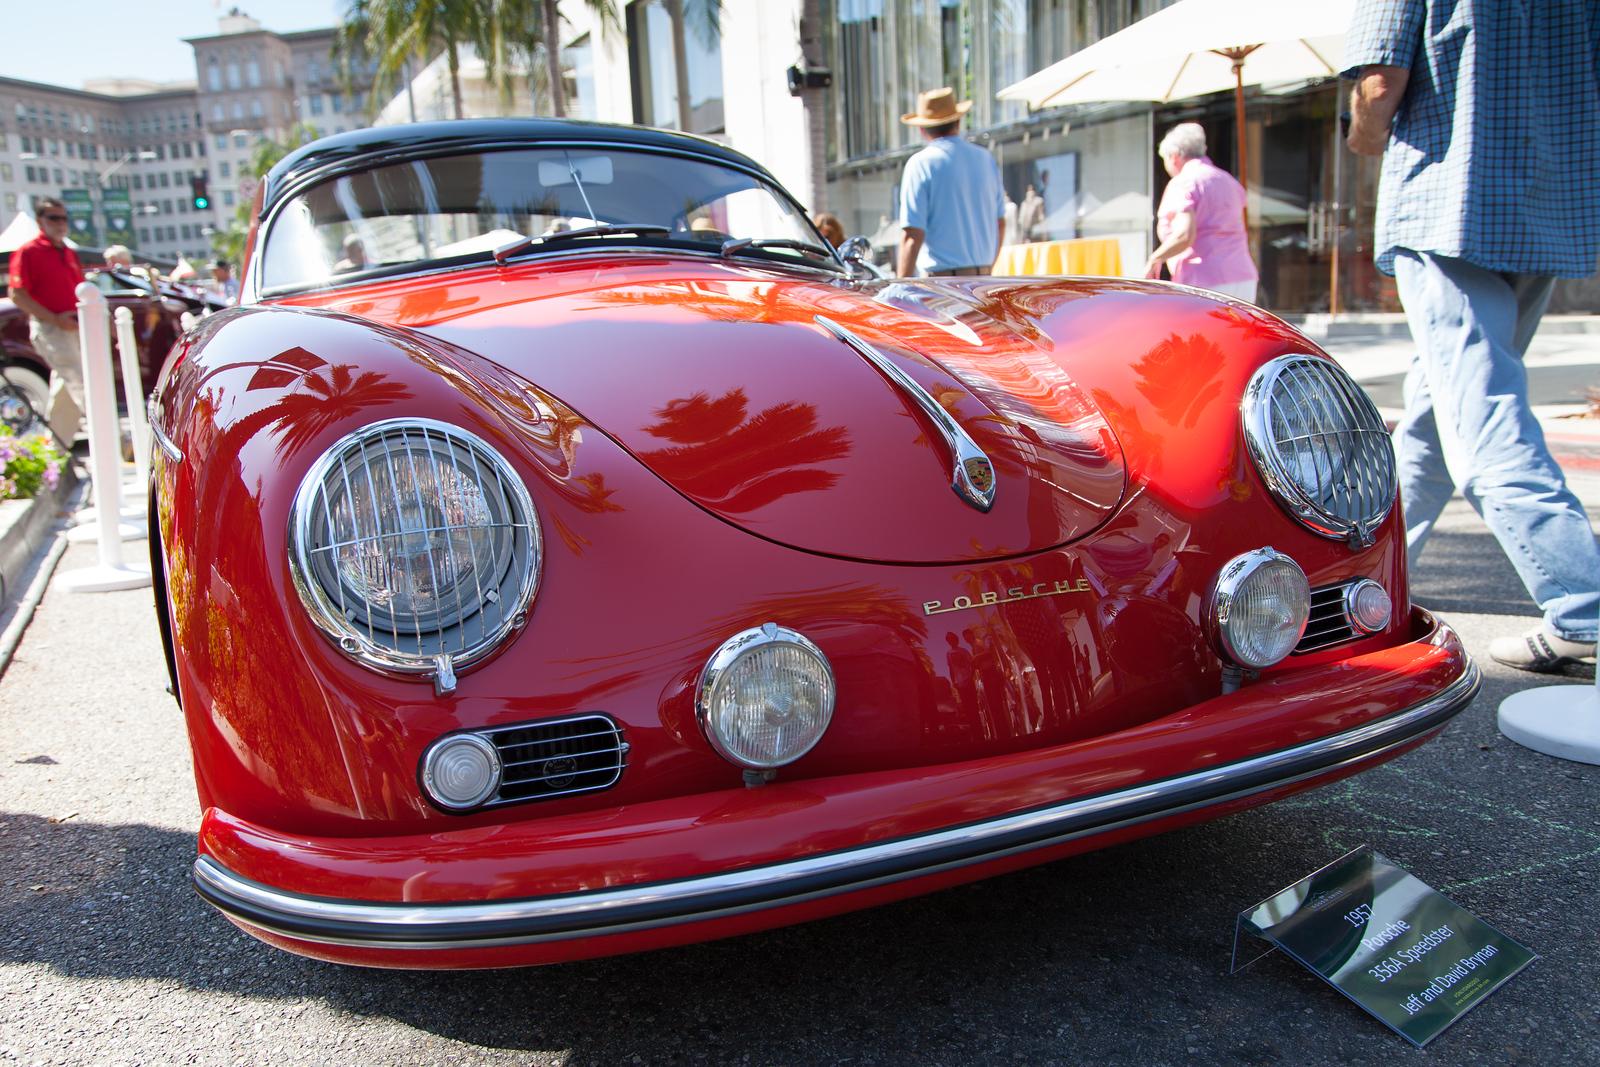 1957 Porsche 356A Speedster, owned by Jeff & David Brynan